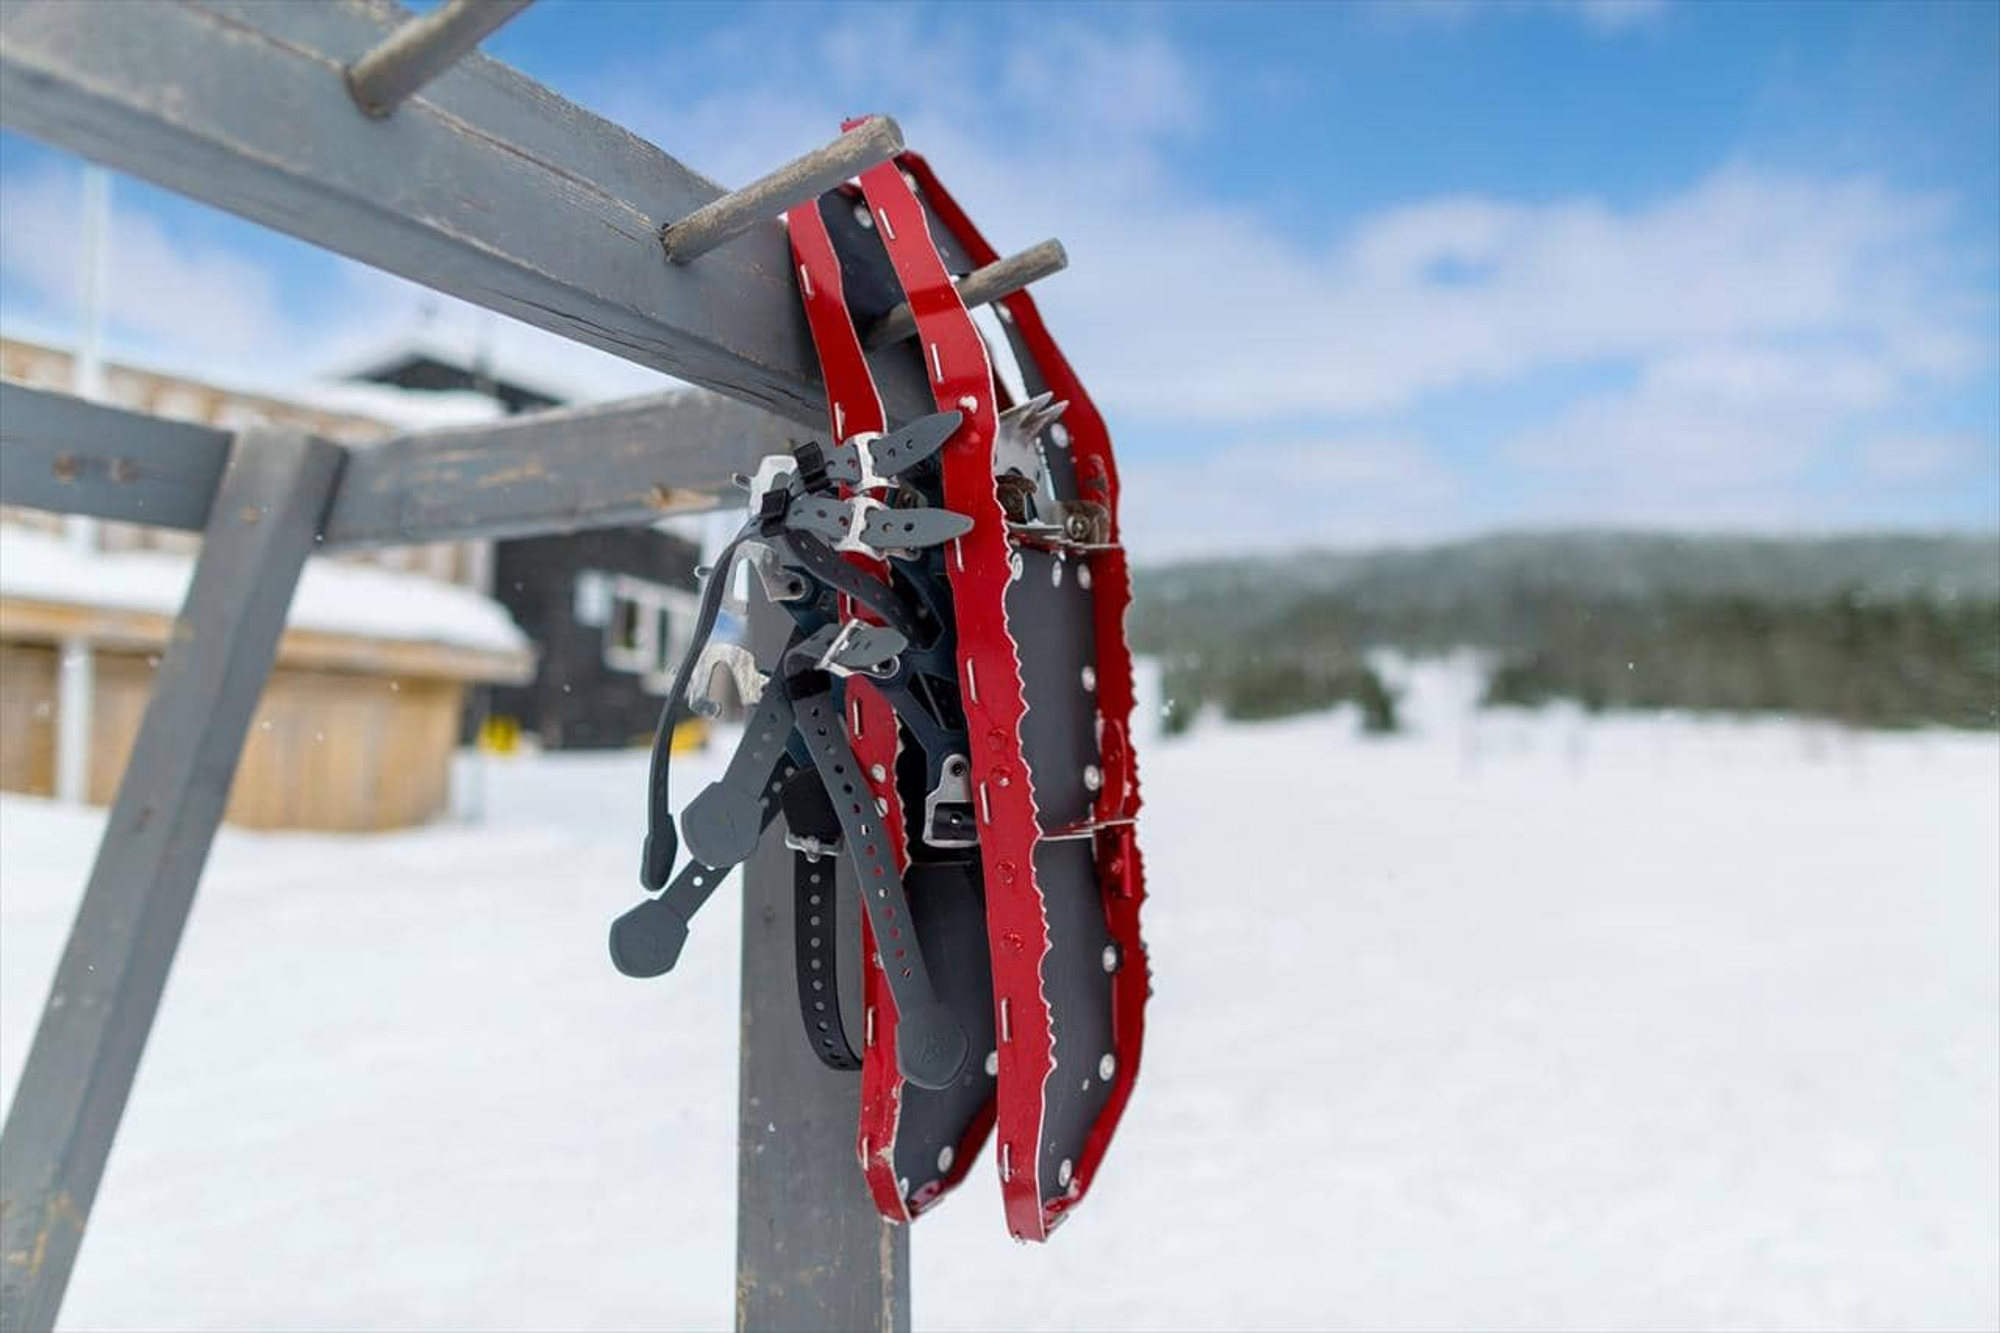 Snowshoes hanging